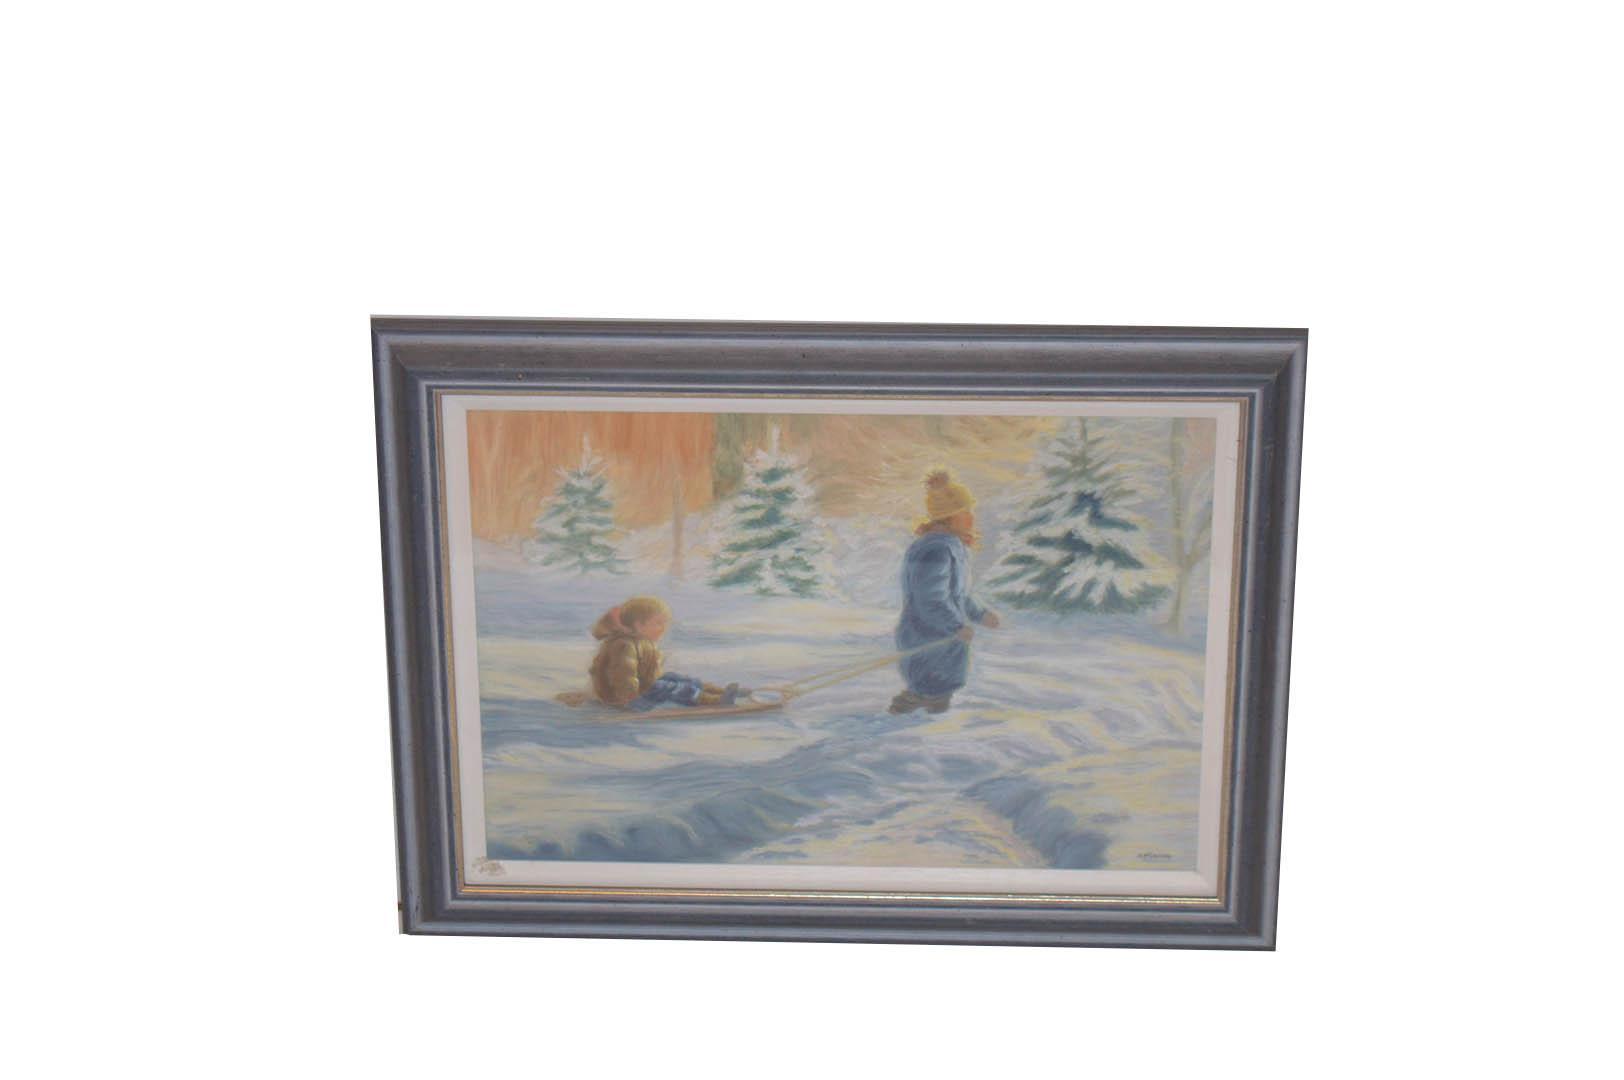 Lot 615 - An Oil Painting 'Children in Snow' - B McCallum